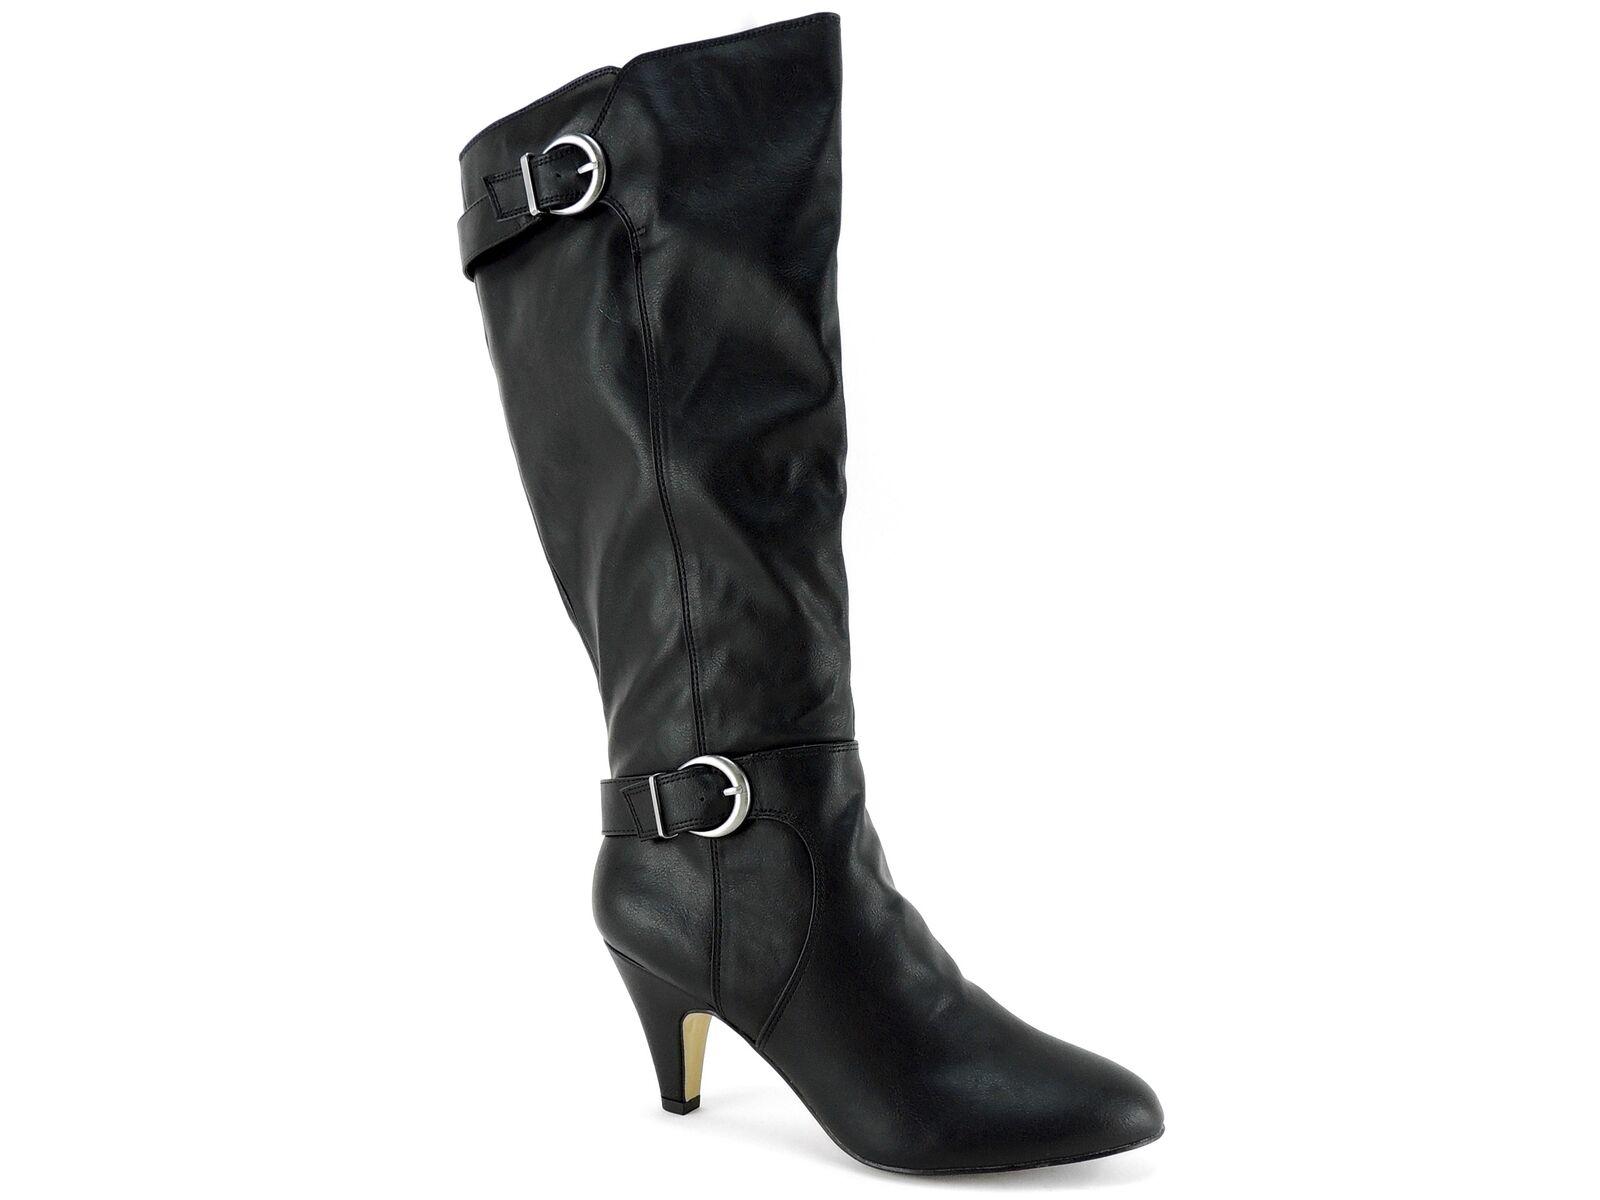 Bella Vita Women's Toni II Plus Harness Boots Black Size 8.5 M Wide Calf